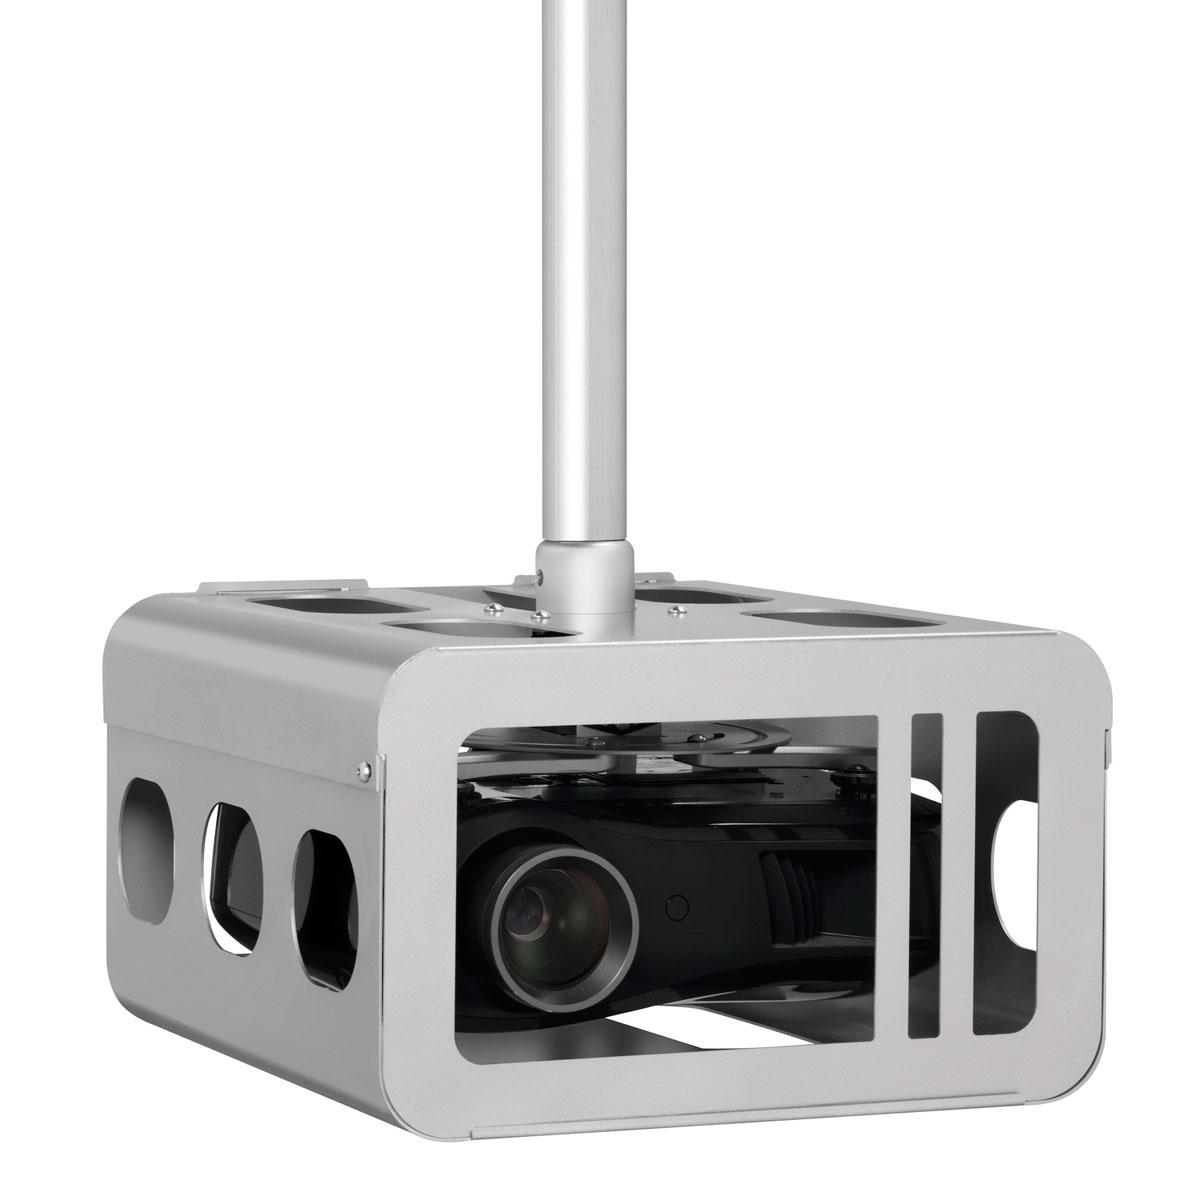 Vogel 39 s professional ppa 310 ppa 310 achat vente - Support plafond videoprojecteur epson ...